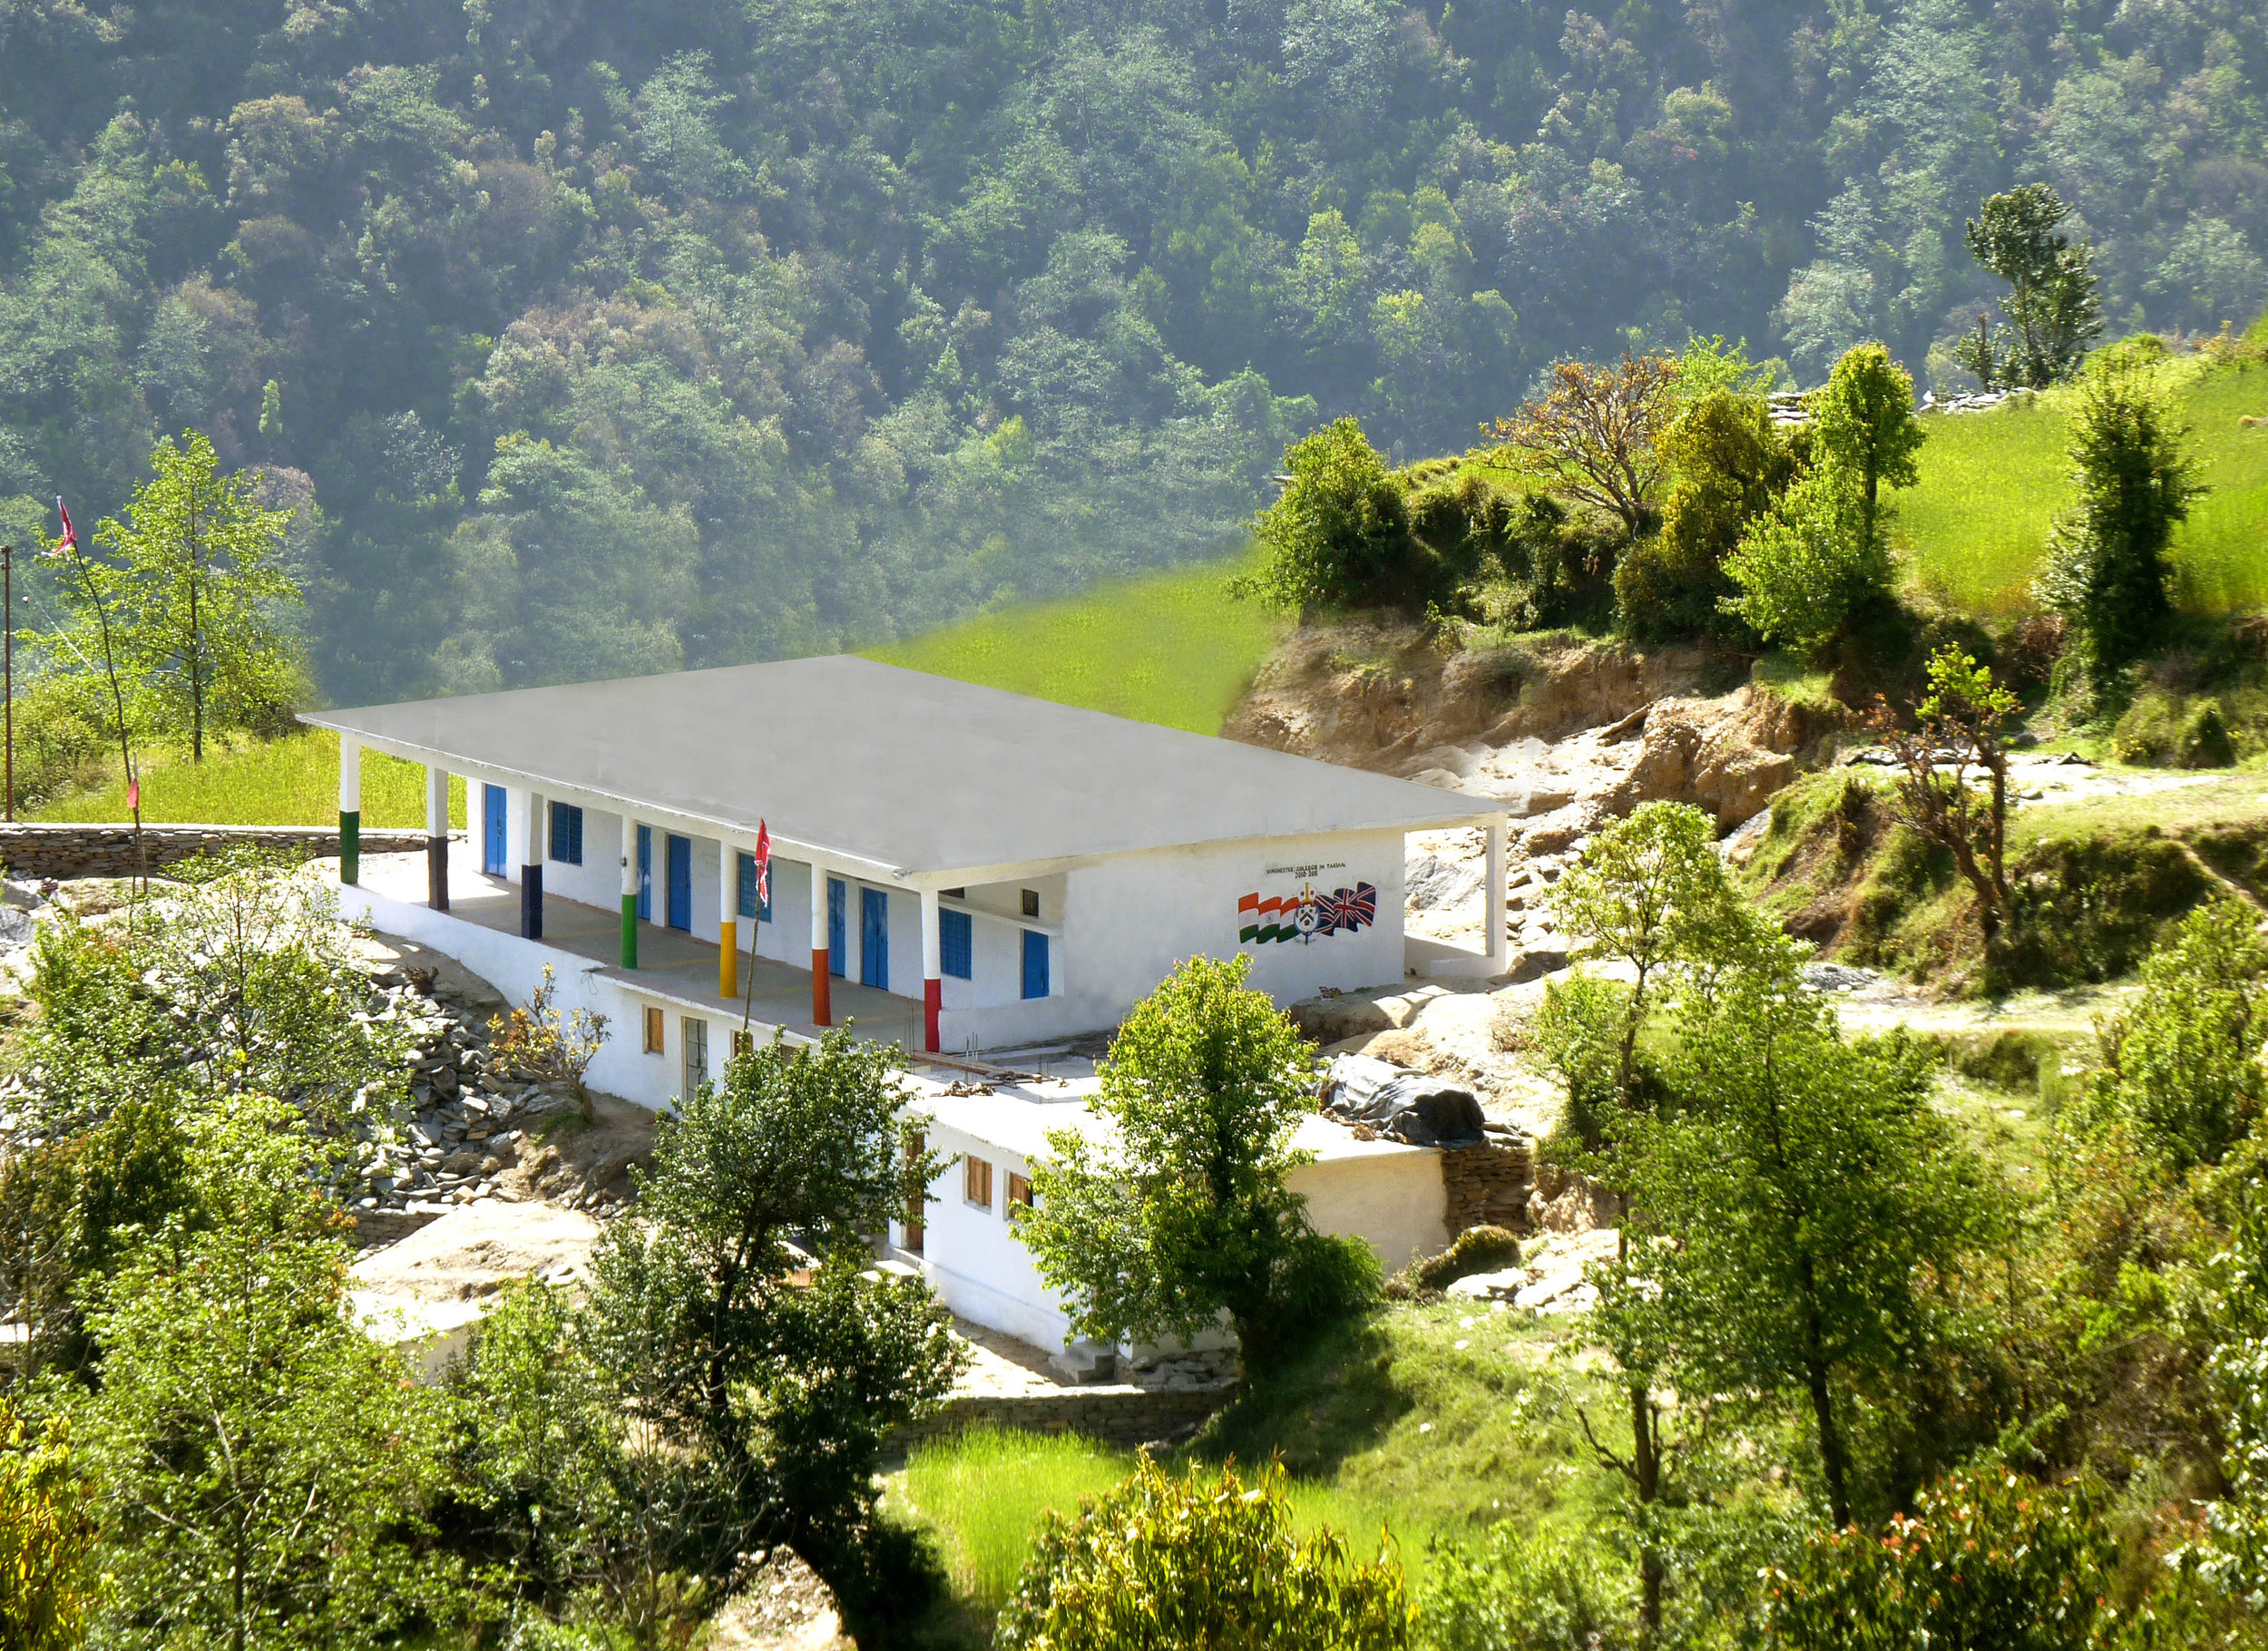 Tarsaal Primary School, Uttrakhand -